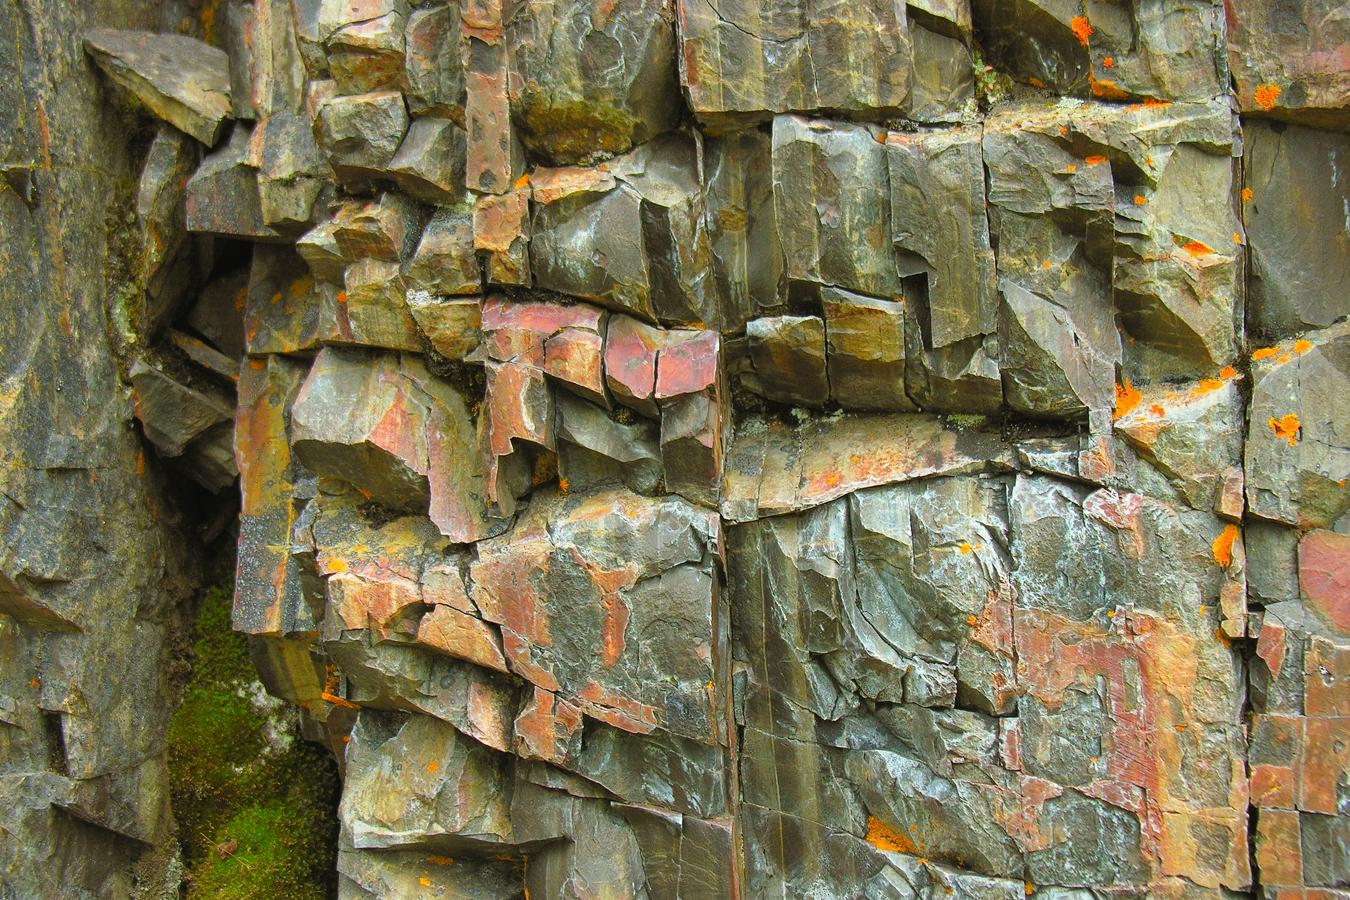 Rock Face Copper 3,6MB.jpg